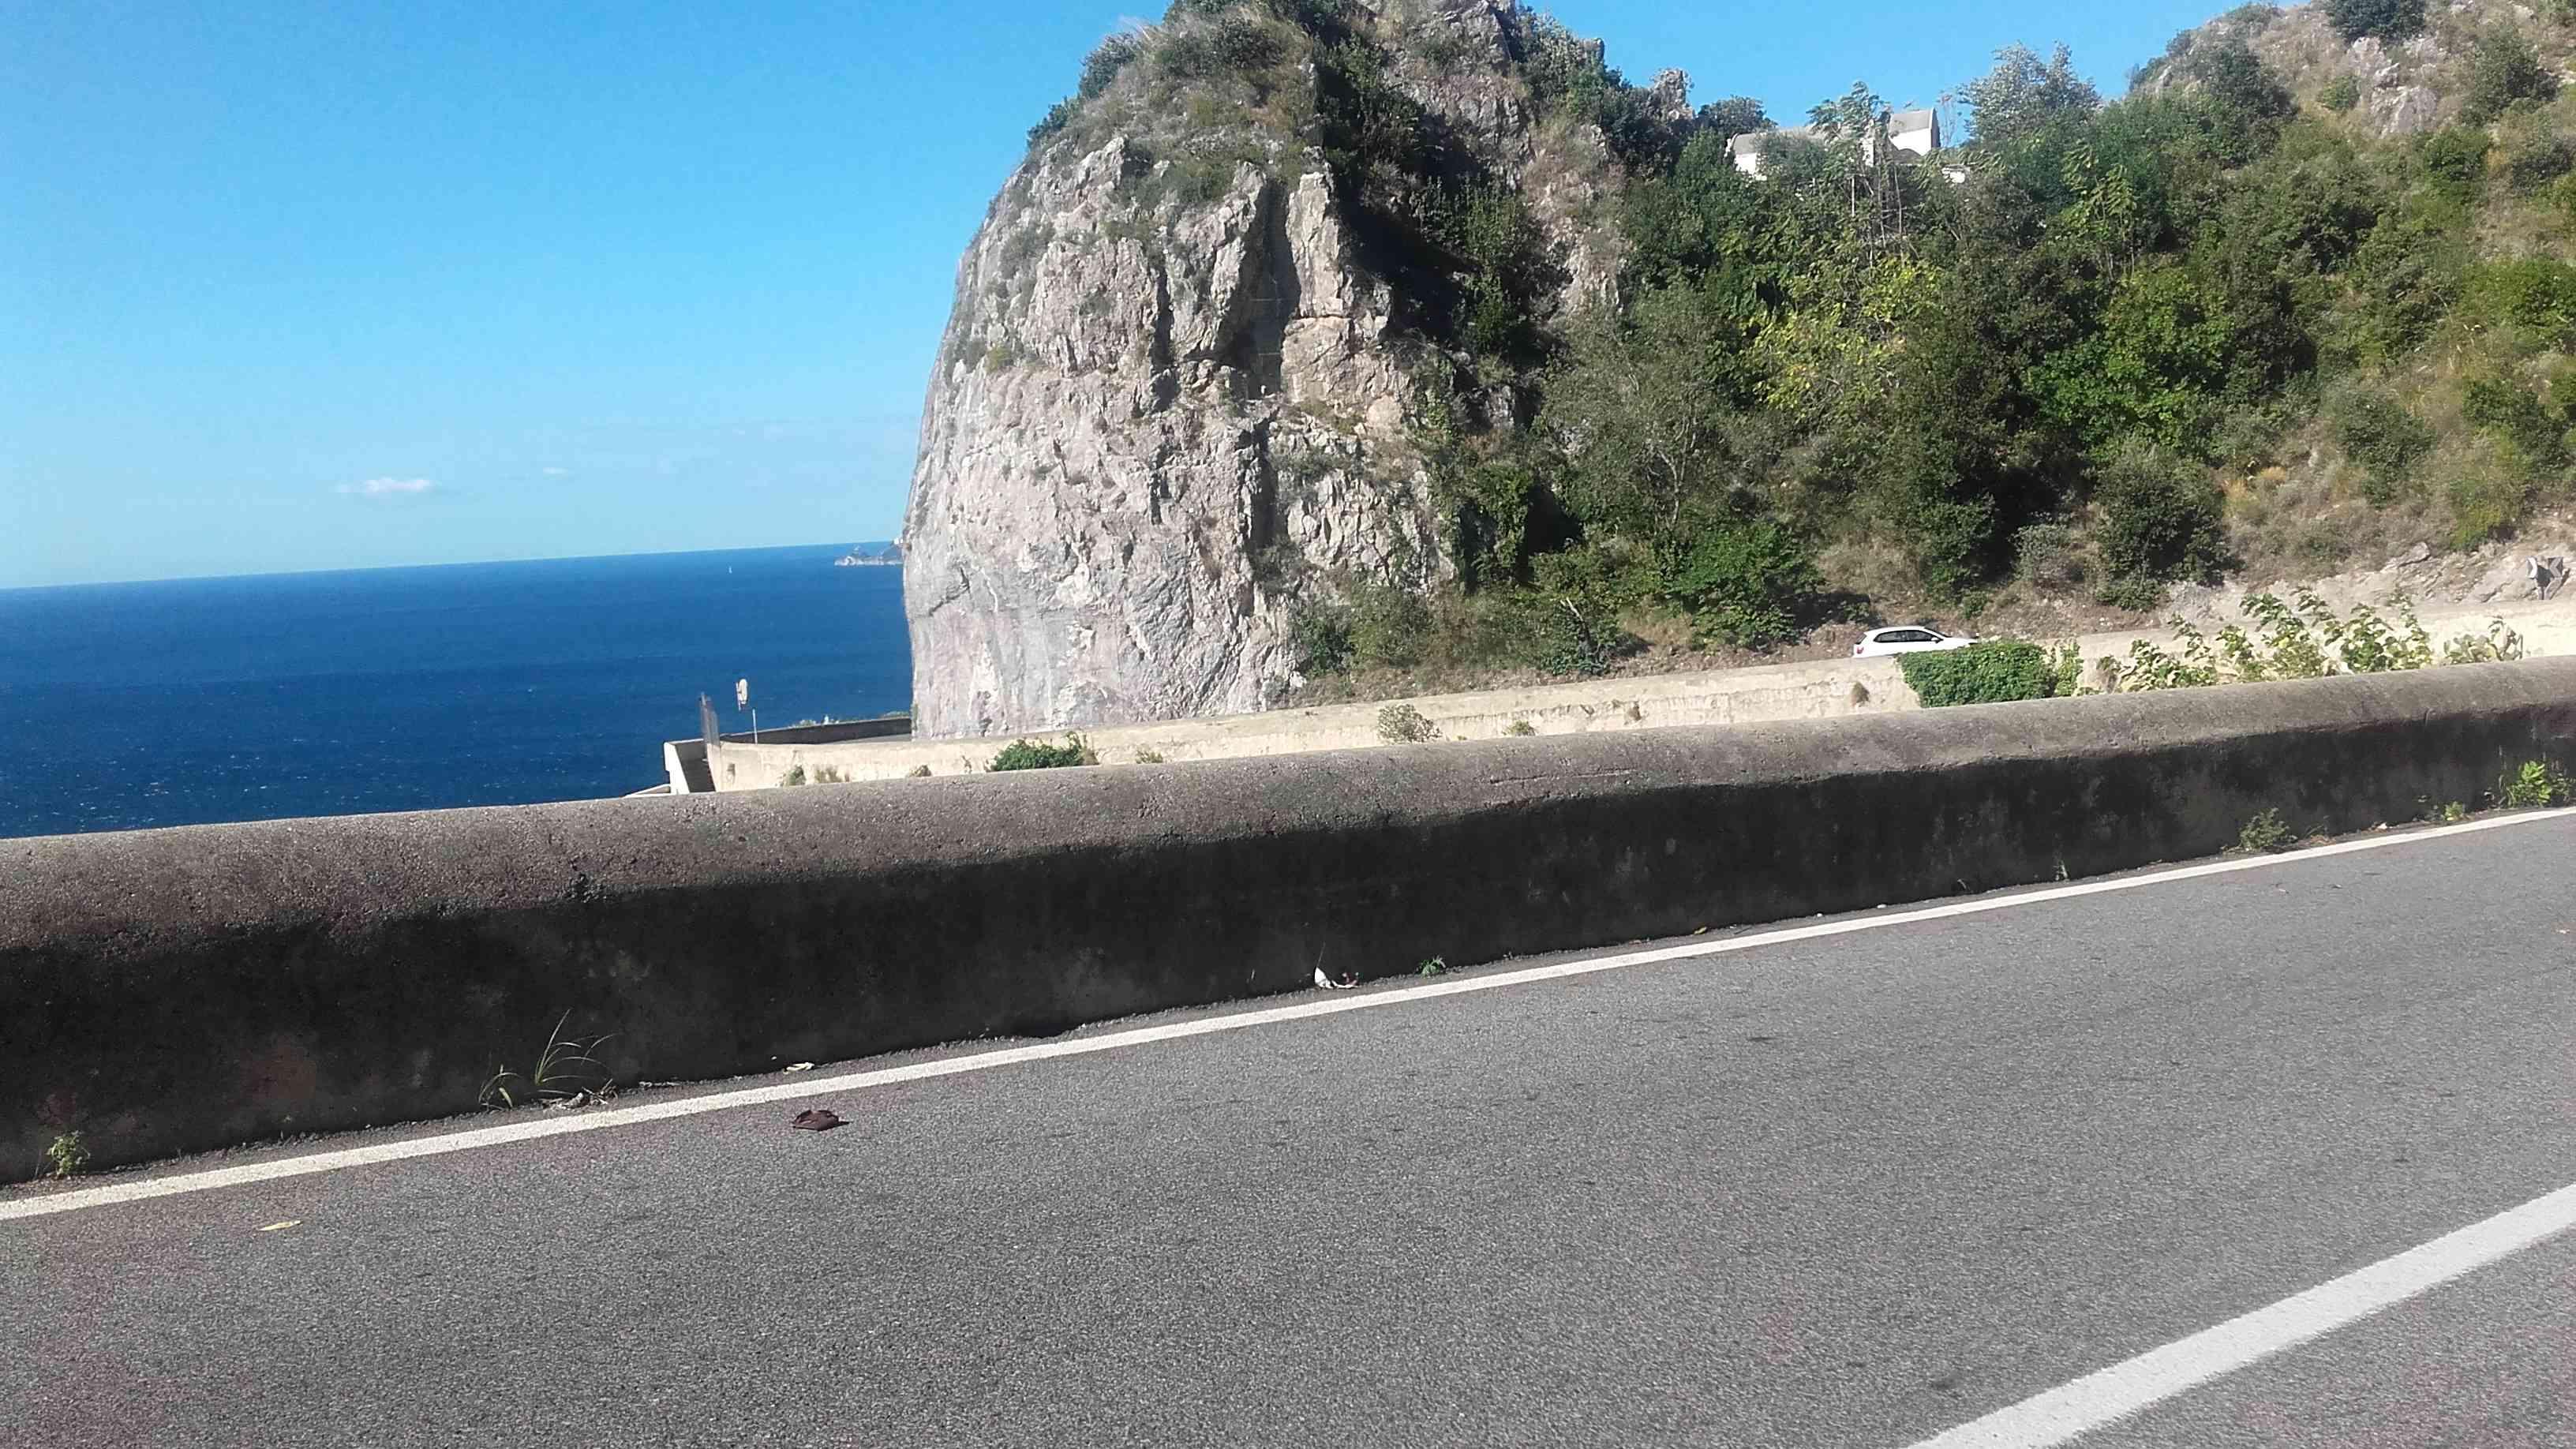 Visita la Costiera Amalfitana in moto